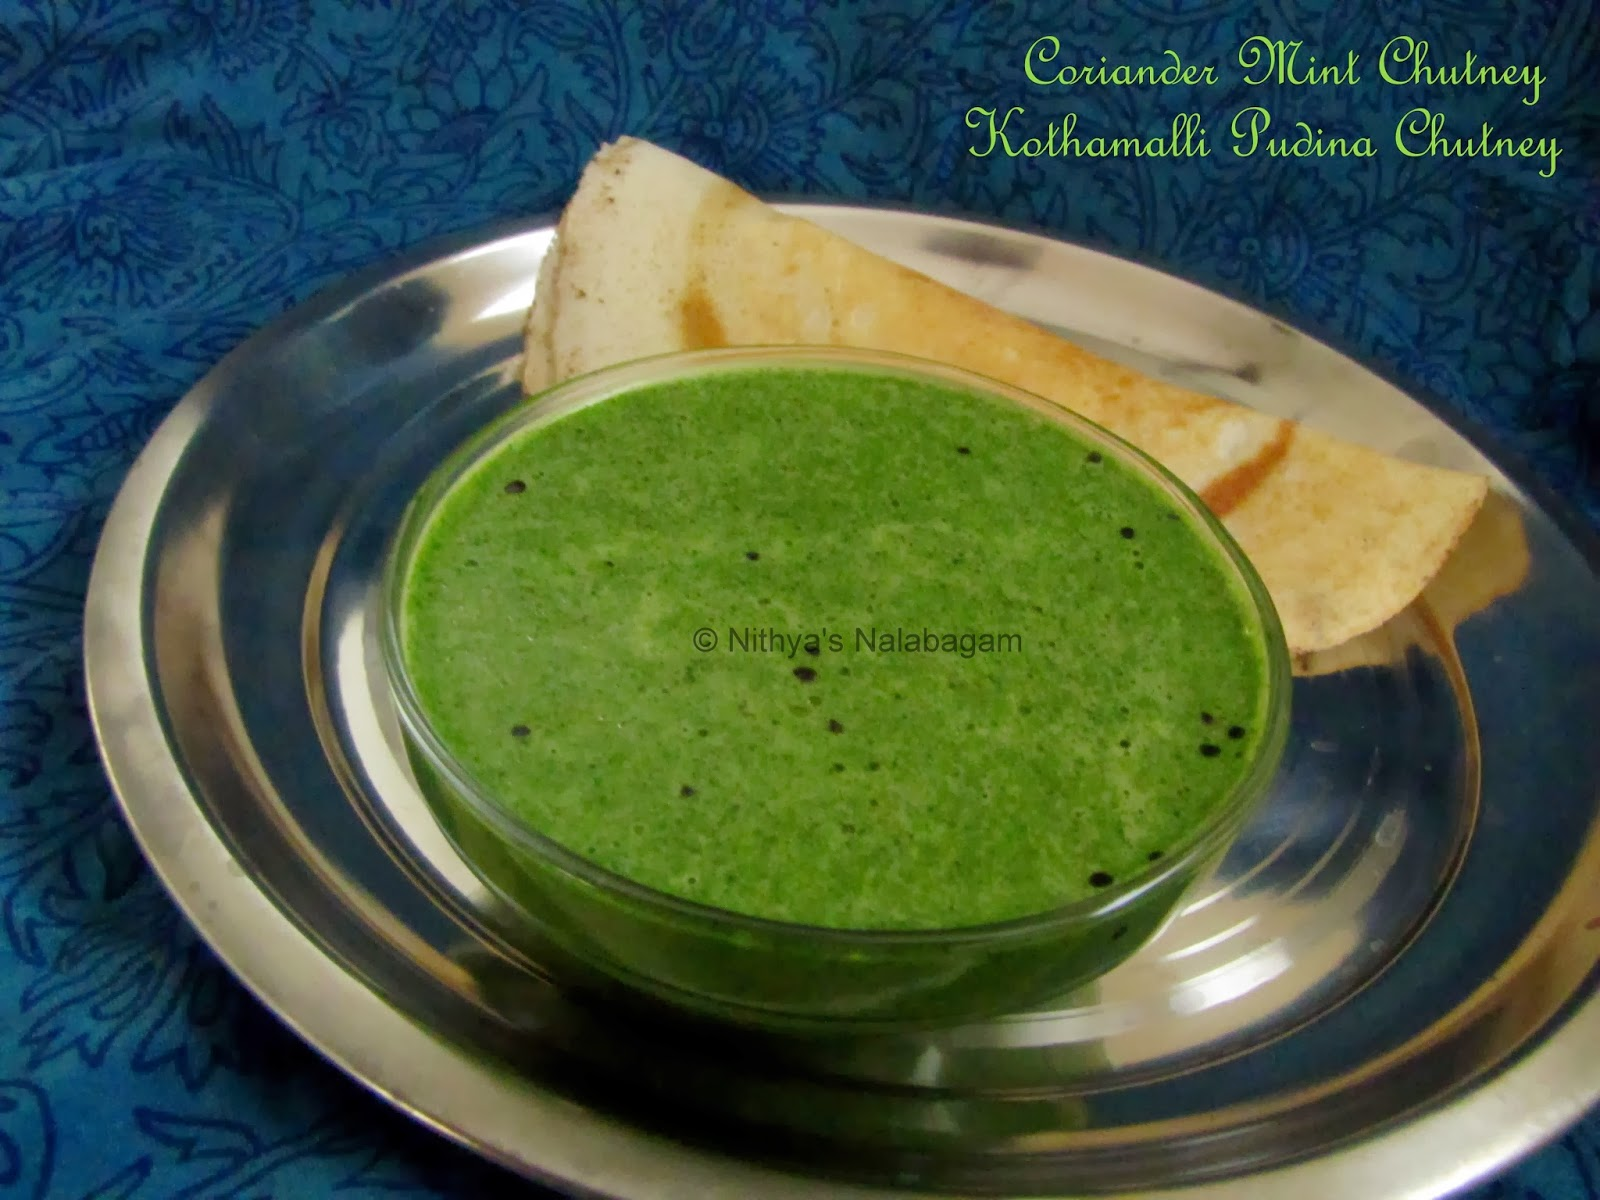 Coriander Mint Chutney South Indian Style |Nithya's Nalabagam